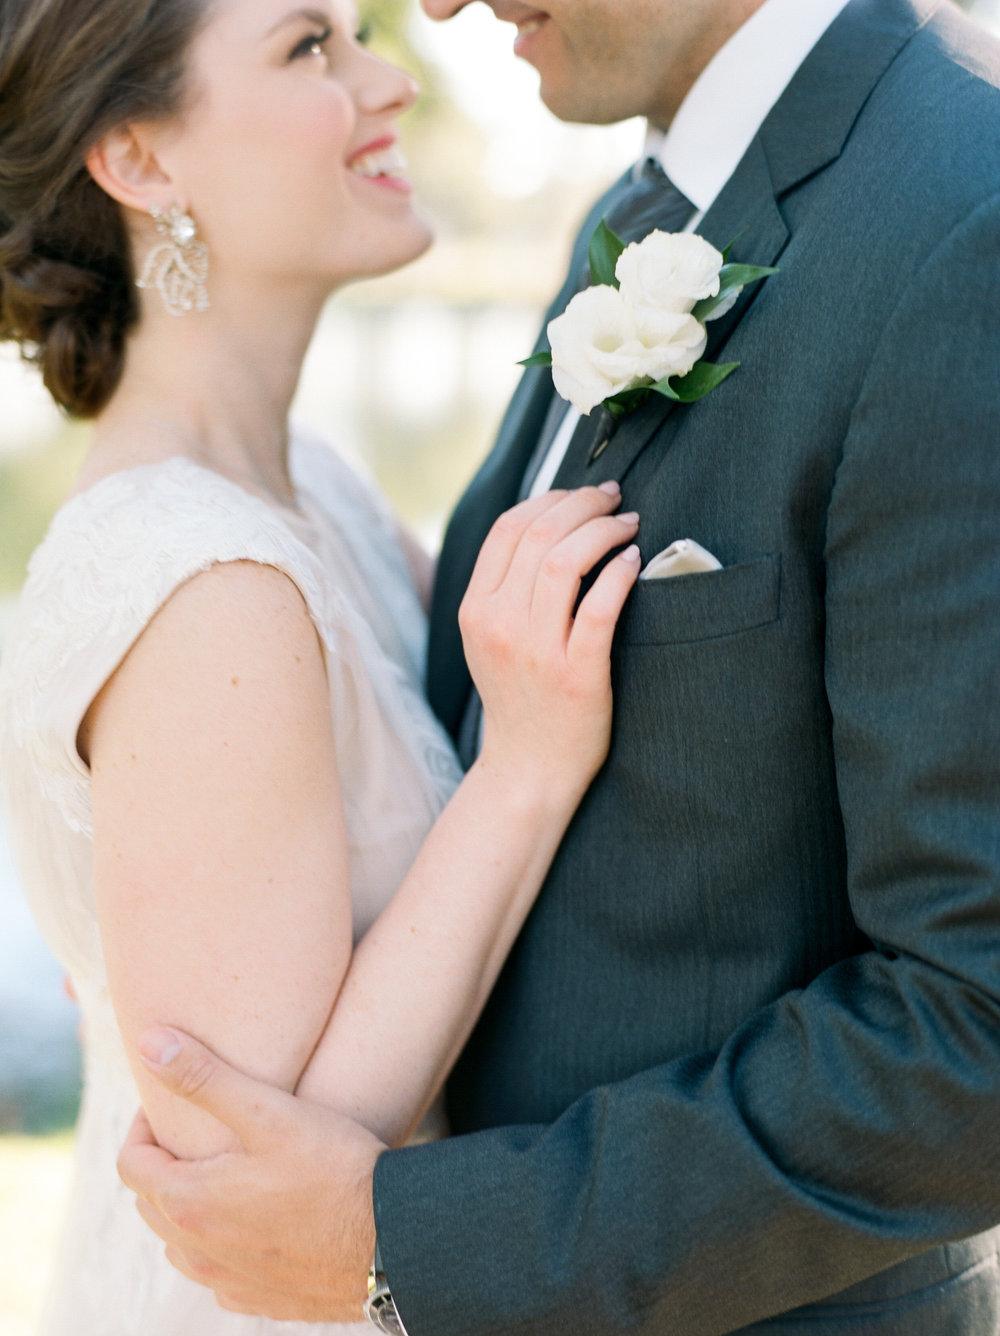 Houston-Wedding-Photographer-Lakeside-Country-Club-First-Look-Bride-Groom-Formals-Film-Fine-Art-Photography-24.jpg